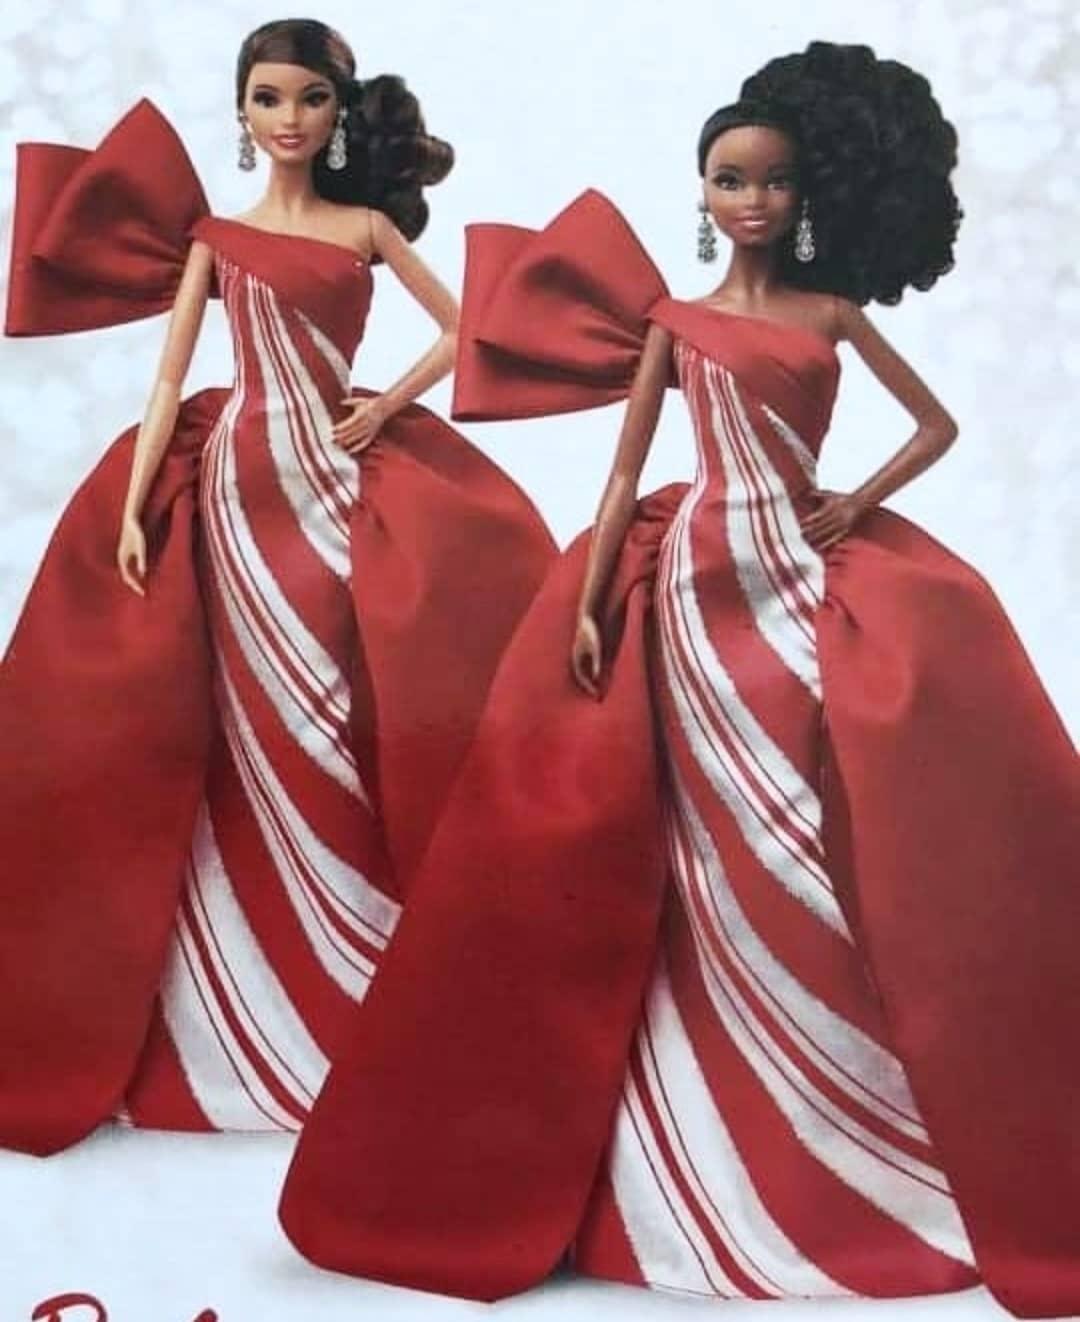 Mattel 2019 Holiday Barbie Doll